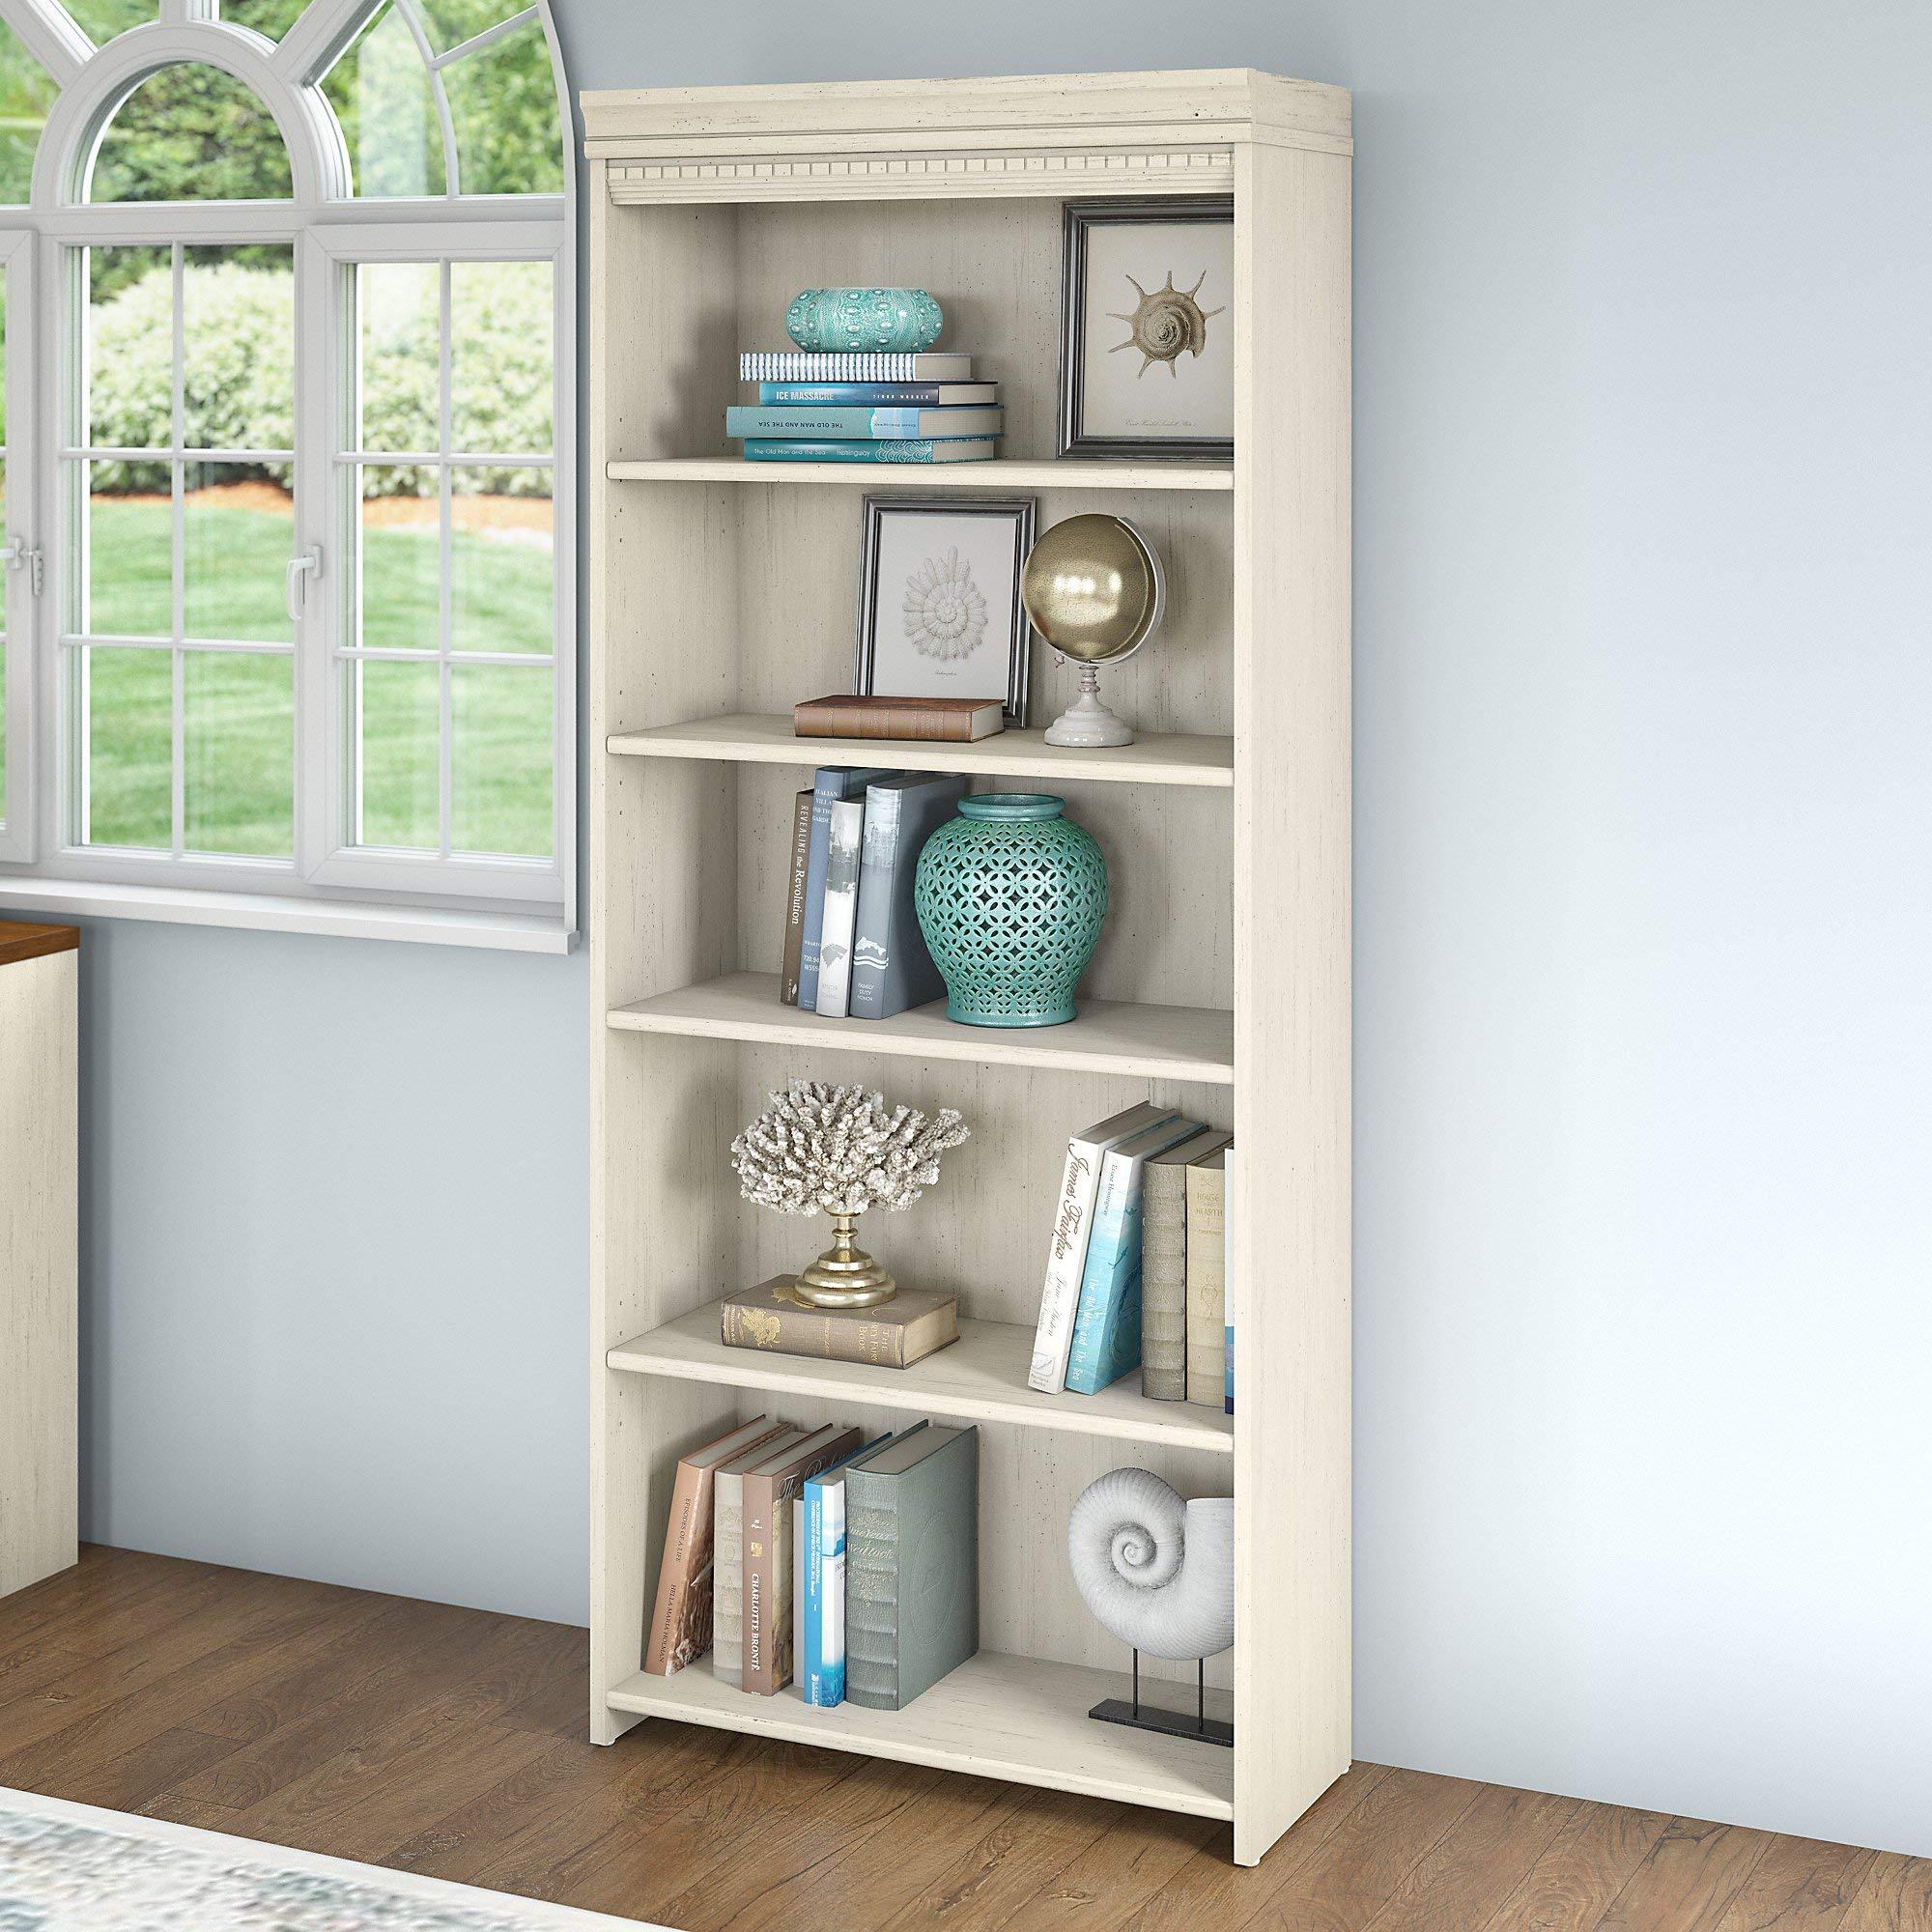 Bush Furniture Fairview 5 Shelf Bookcase in Antique White by Bush Furniture (Image #3)